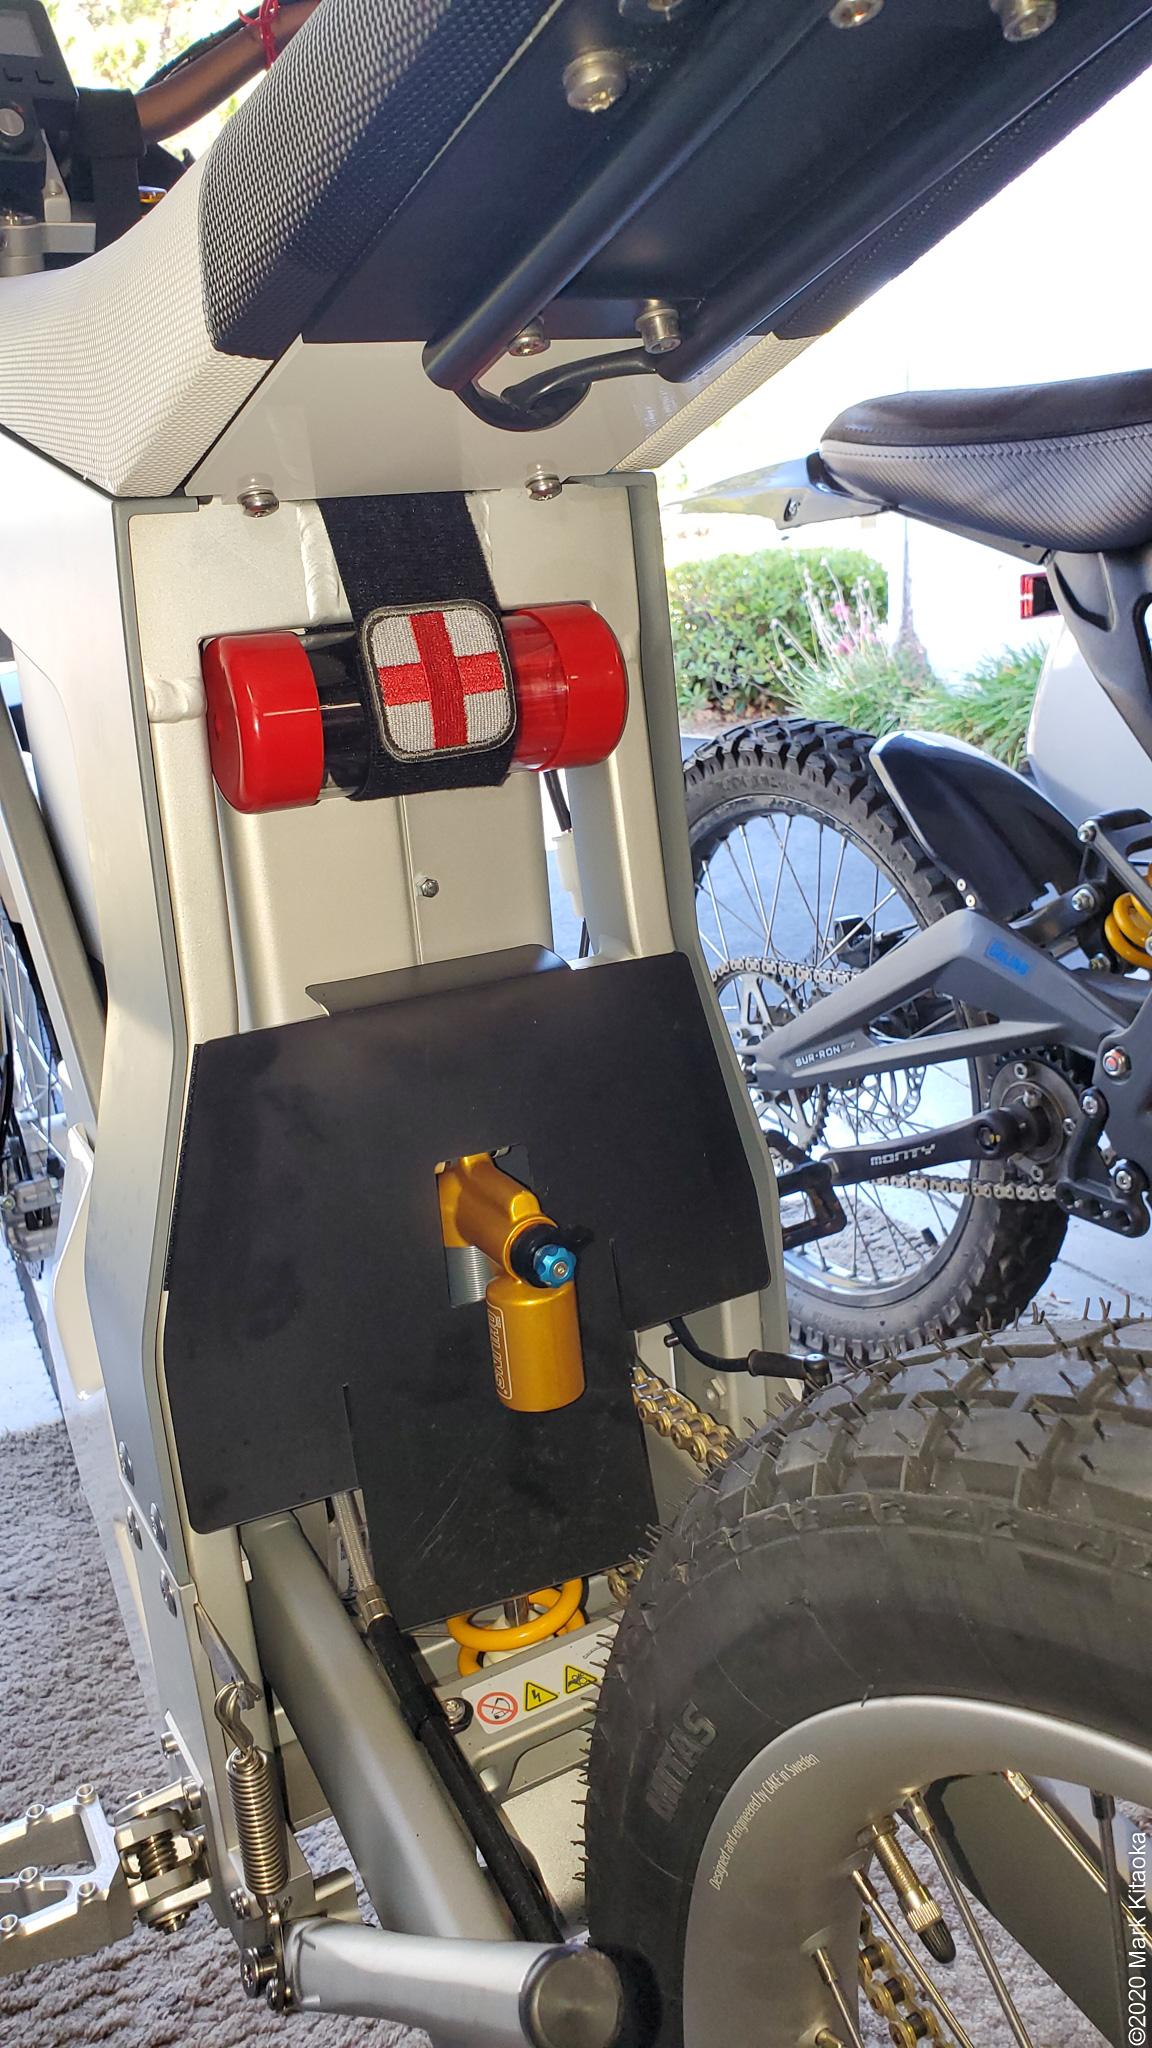 First aid kit on back of Kalk bike